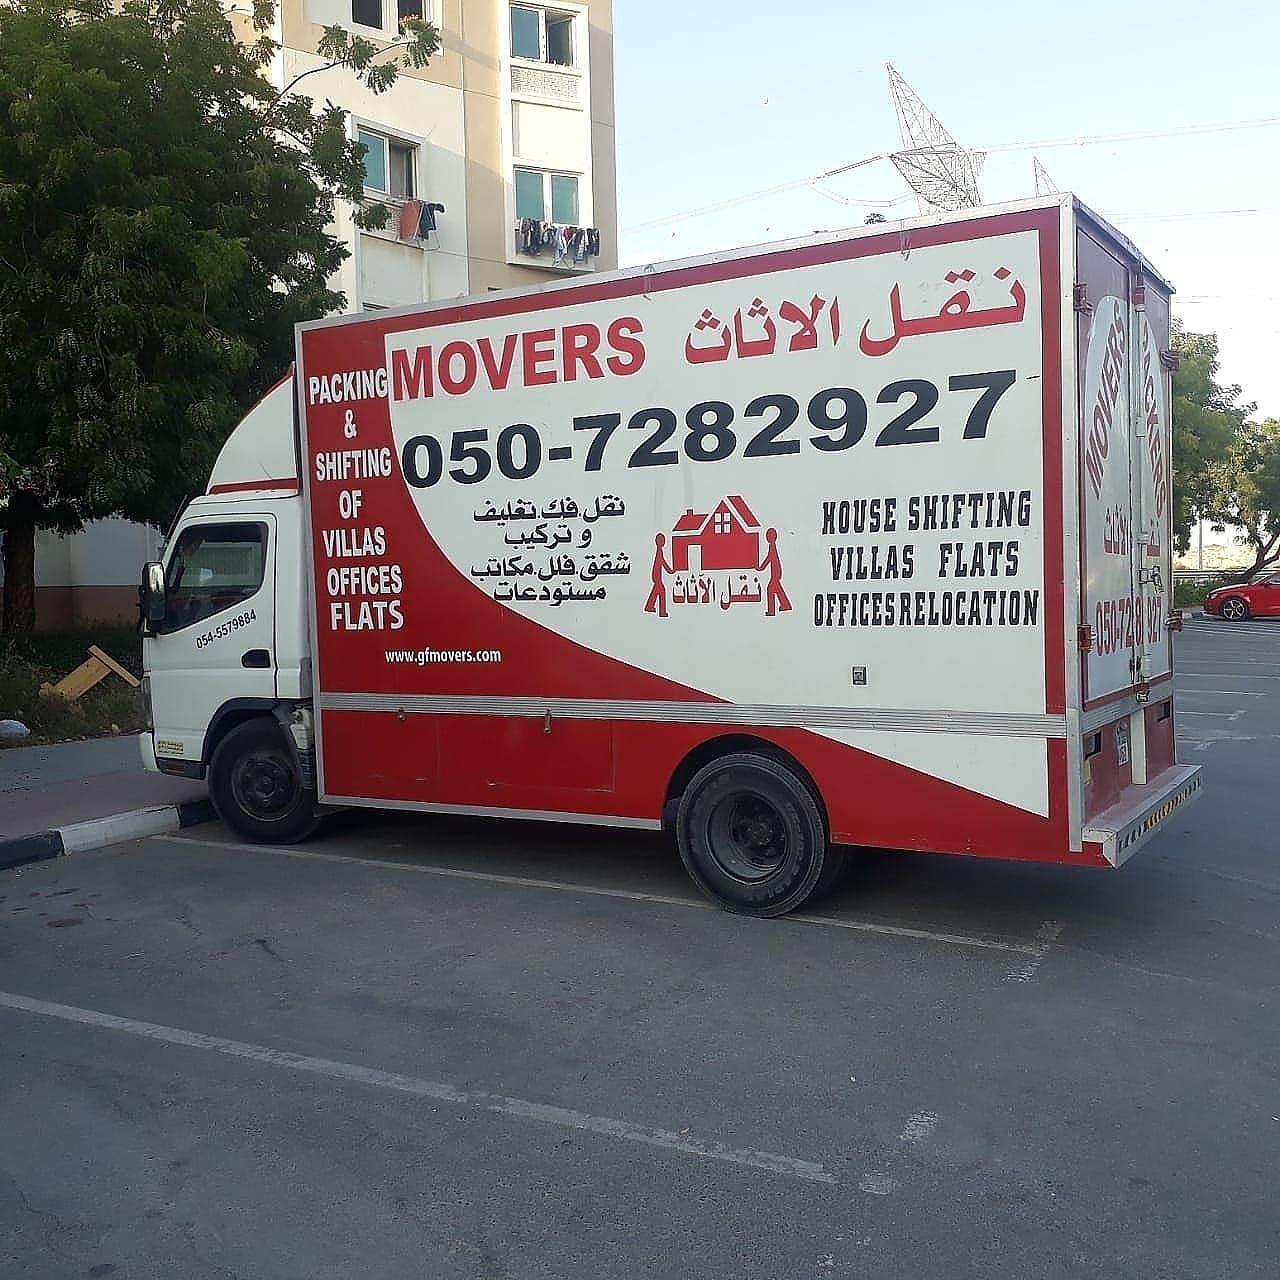 Gulf movers